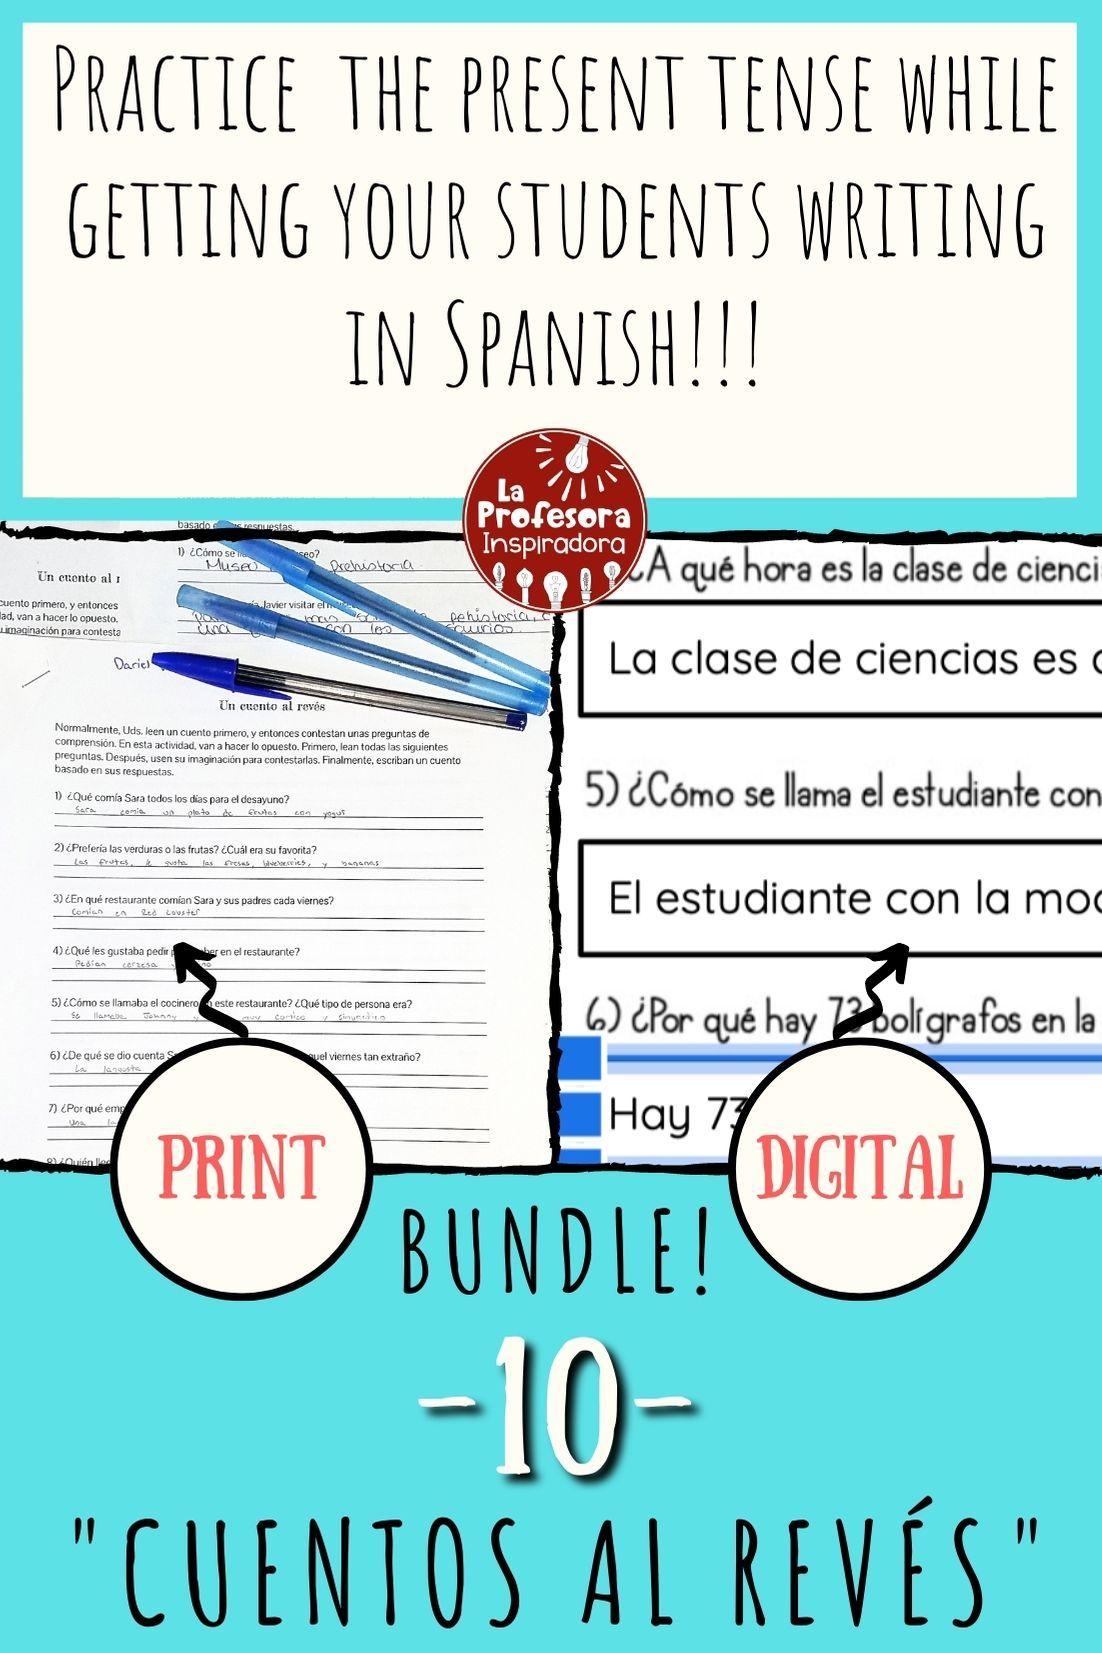 Students Have Fun Writing In Spanish Writing Activities Creative Writing Activities Vocabulary Activities [ 1653 x 1102 Pixel ]